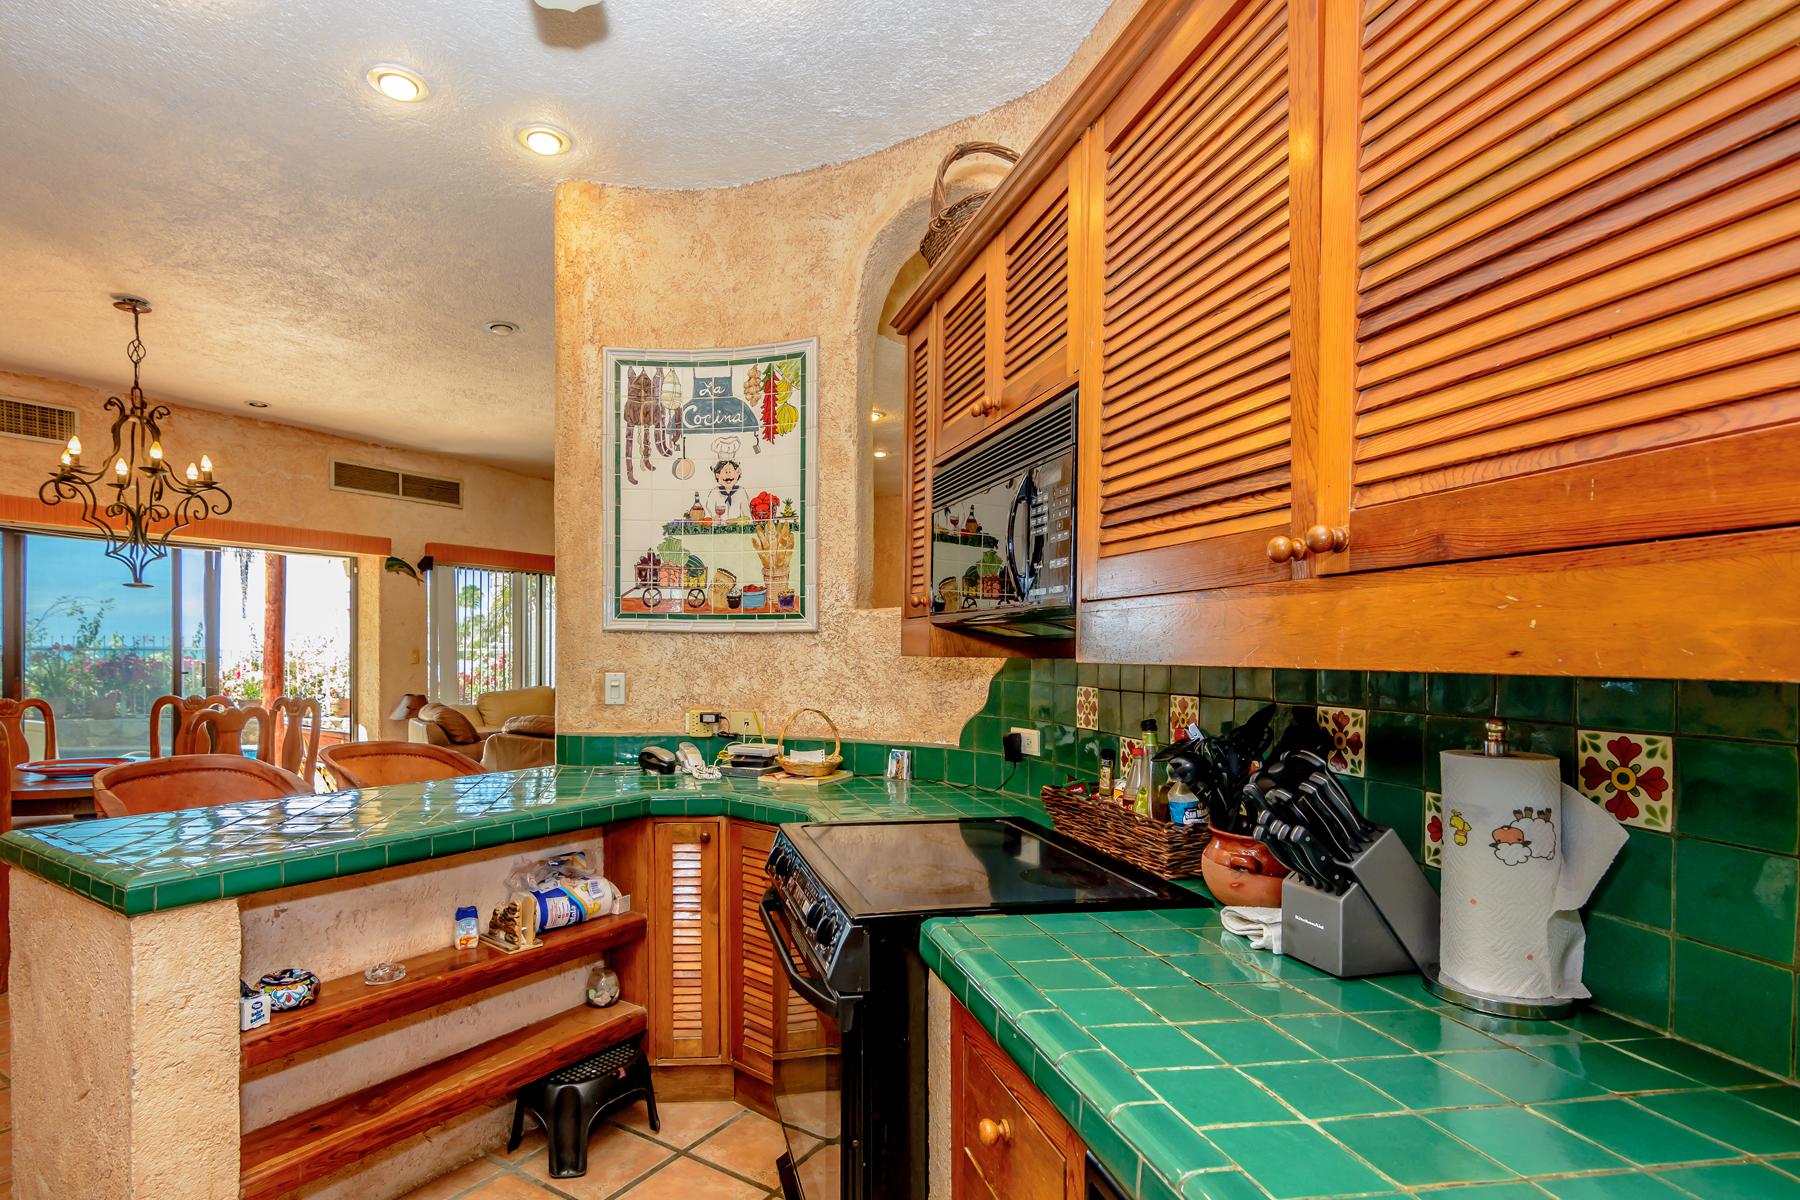 Additional photo for property listing at Casa de la Playa San Jose Del Cabo, Baja California Sur Mexico